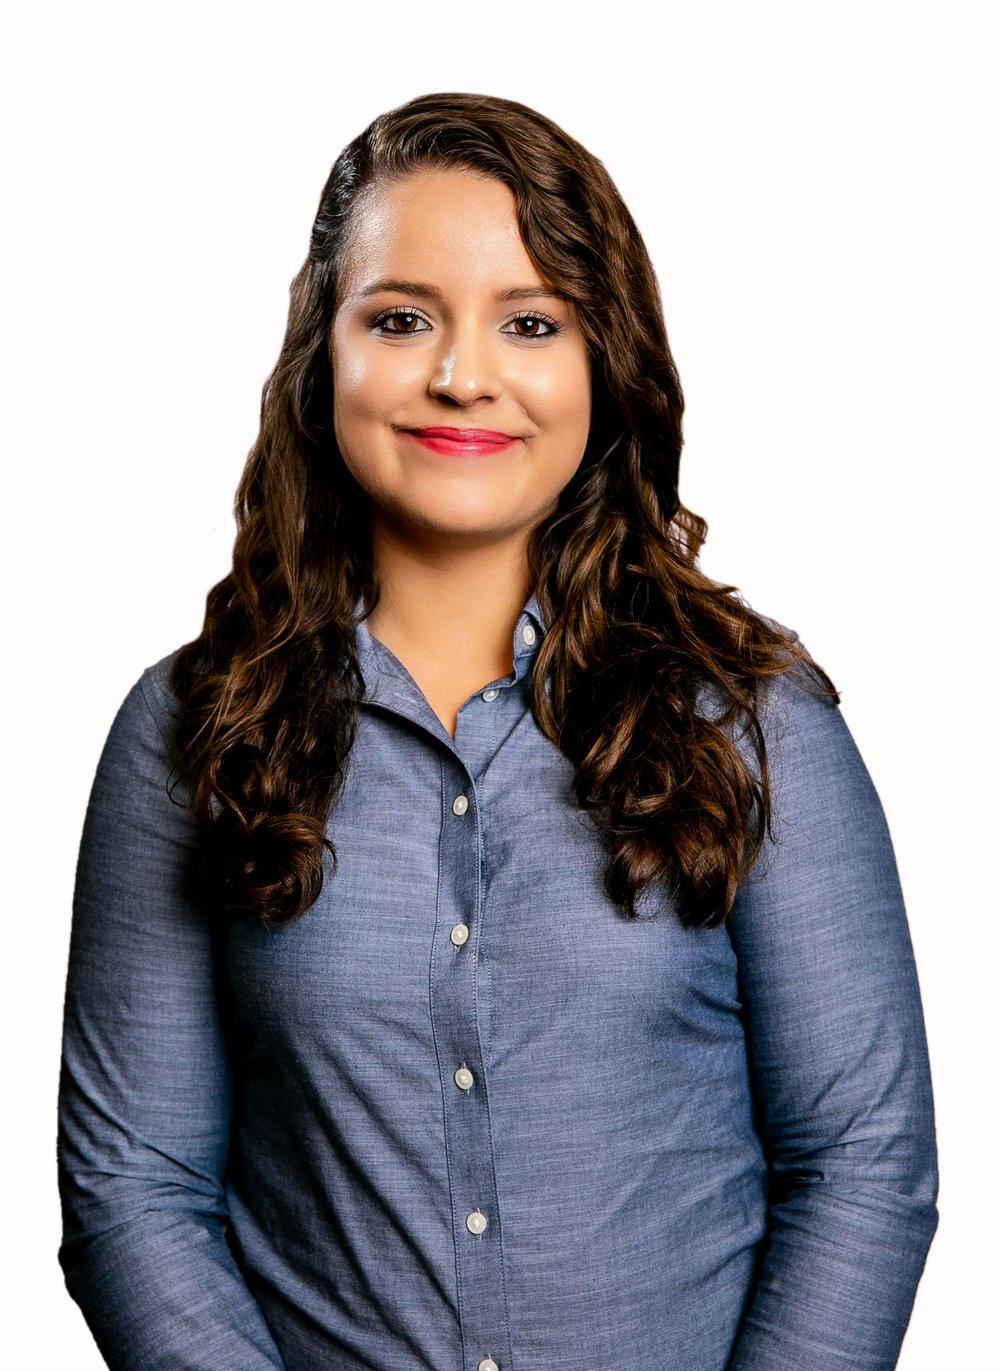 Lizette Ibal